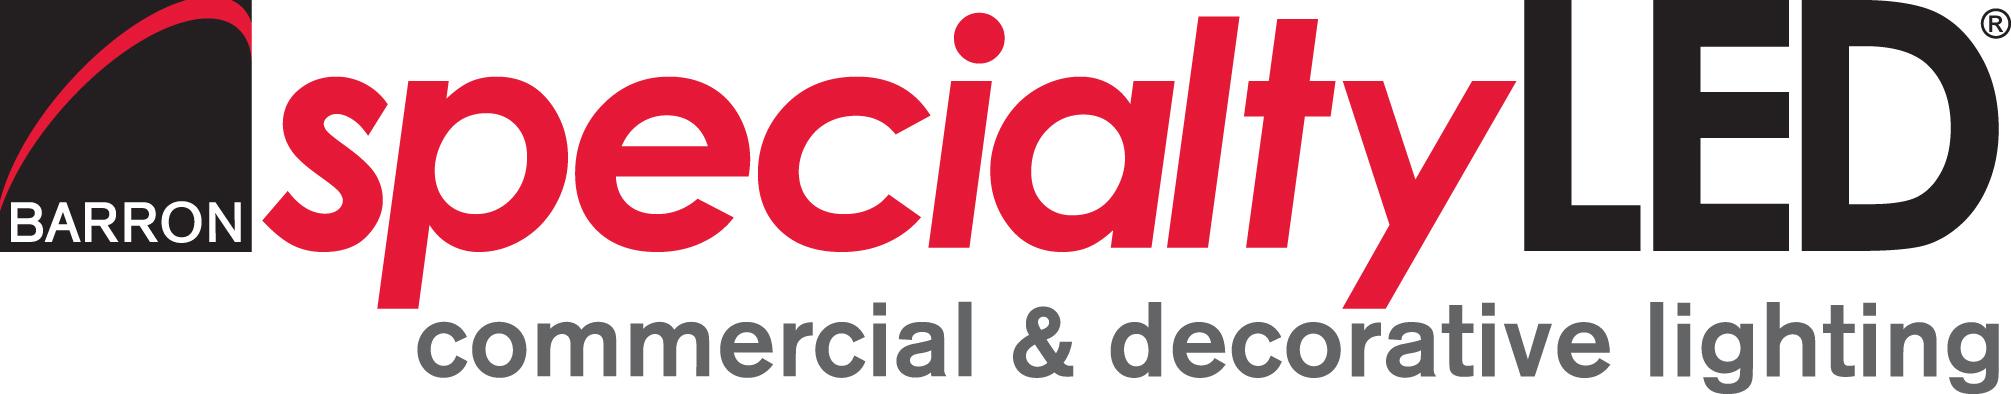 specialty_led_logo.jpg